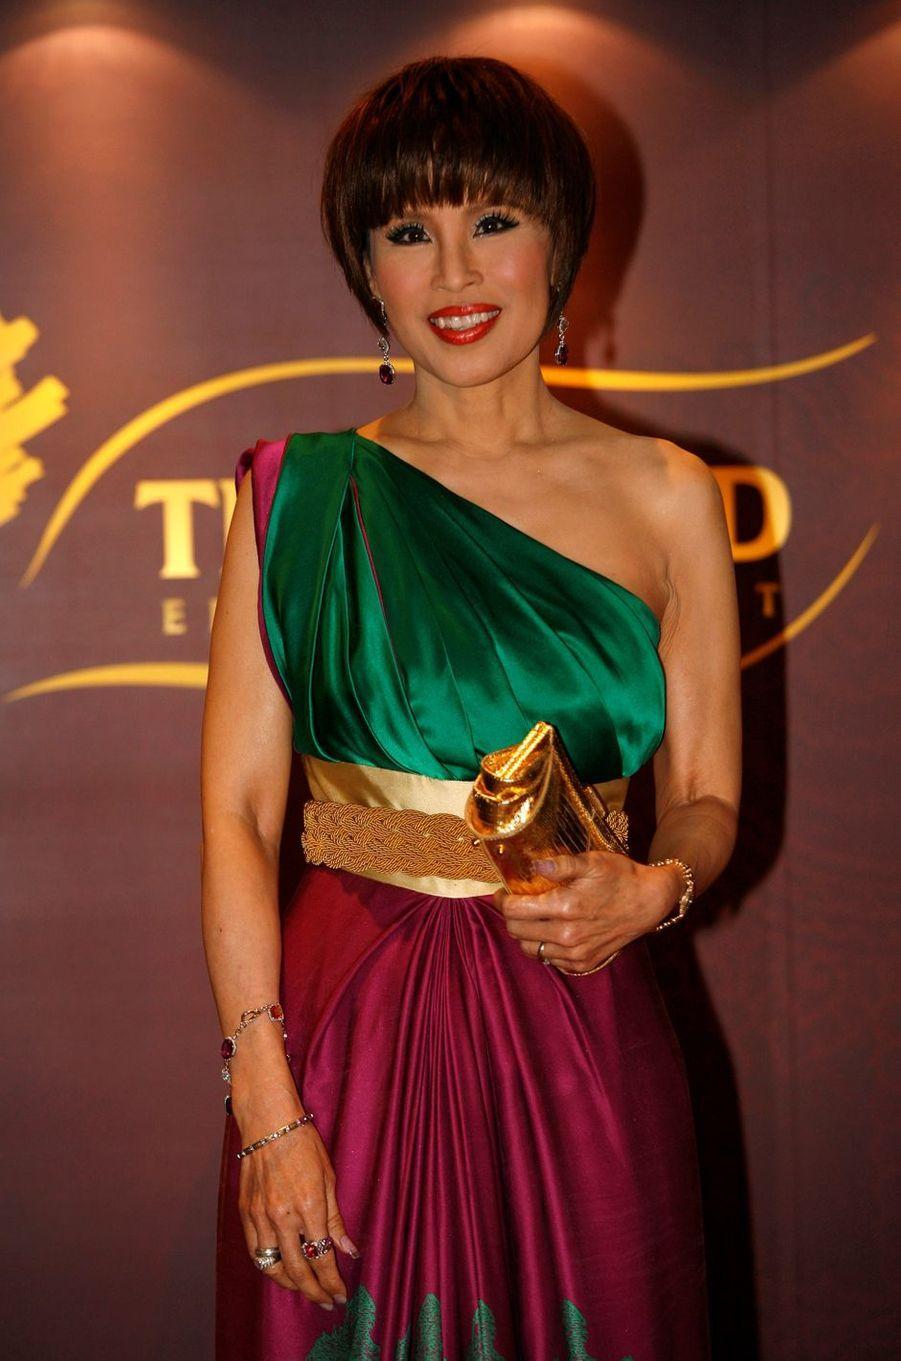 La princesse Ubolratana de Thaïlande à Hong Kong, le 24 mars 2010